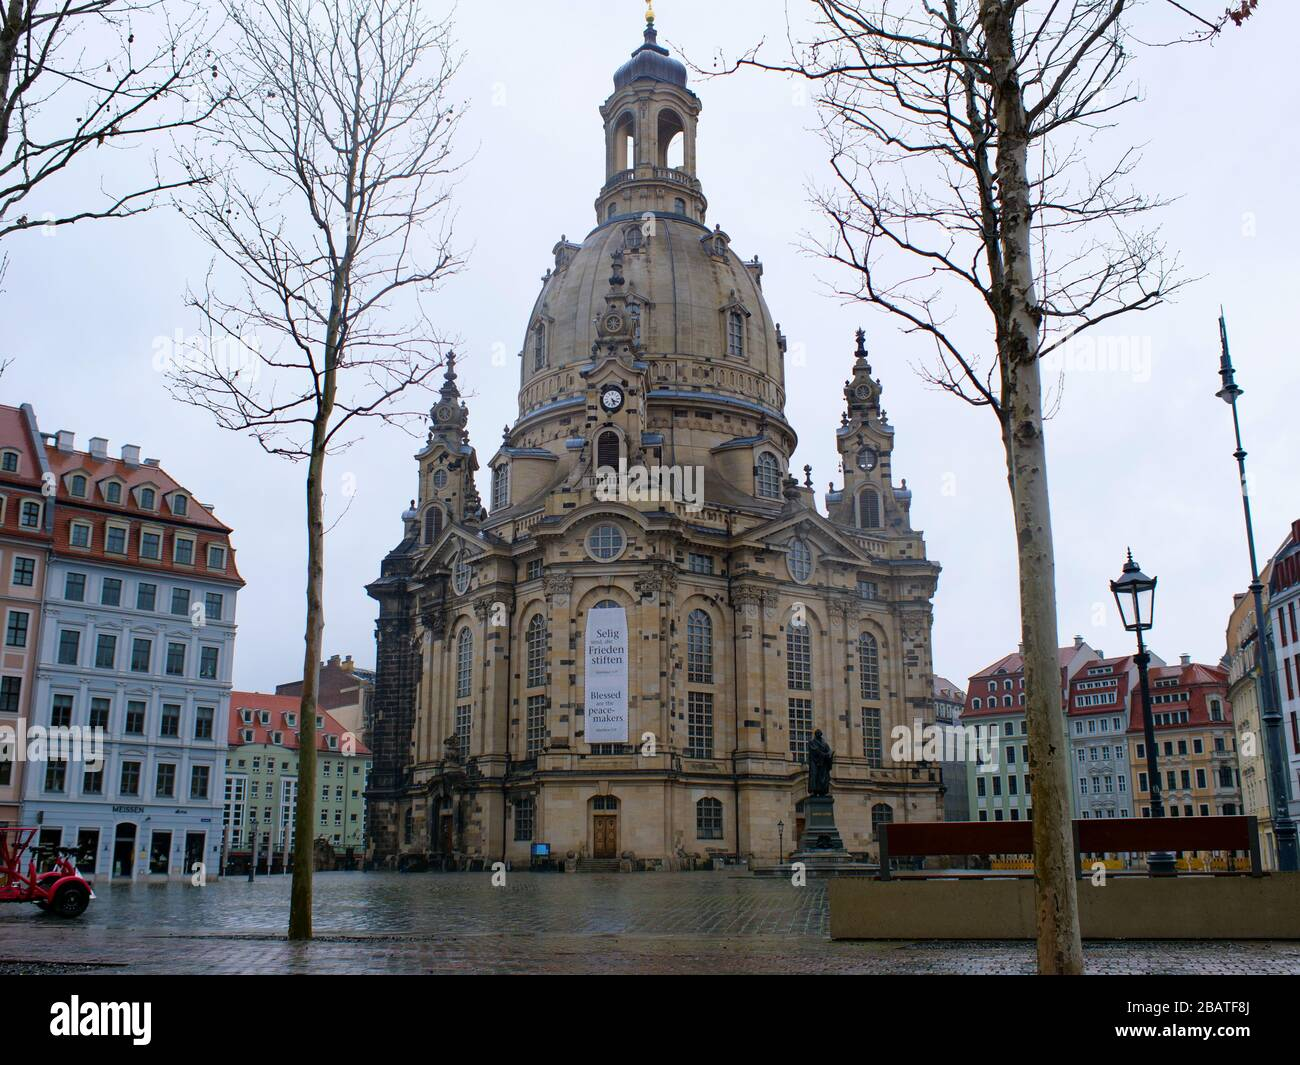 Dresden Frauenkirche während Coronavirus leerer Neumarkt Tourismus Corona Lockdown virus Ausgangssperre Kontaktsperre Foto de stock